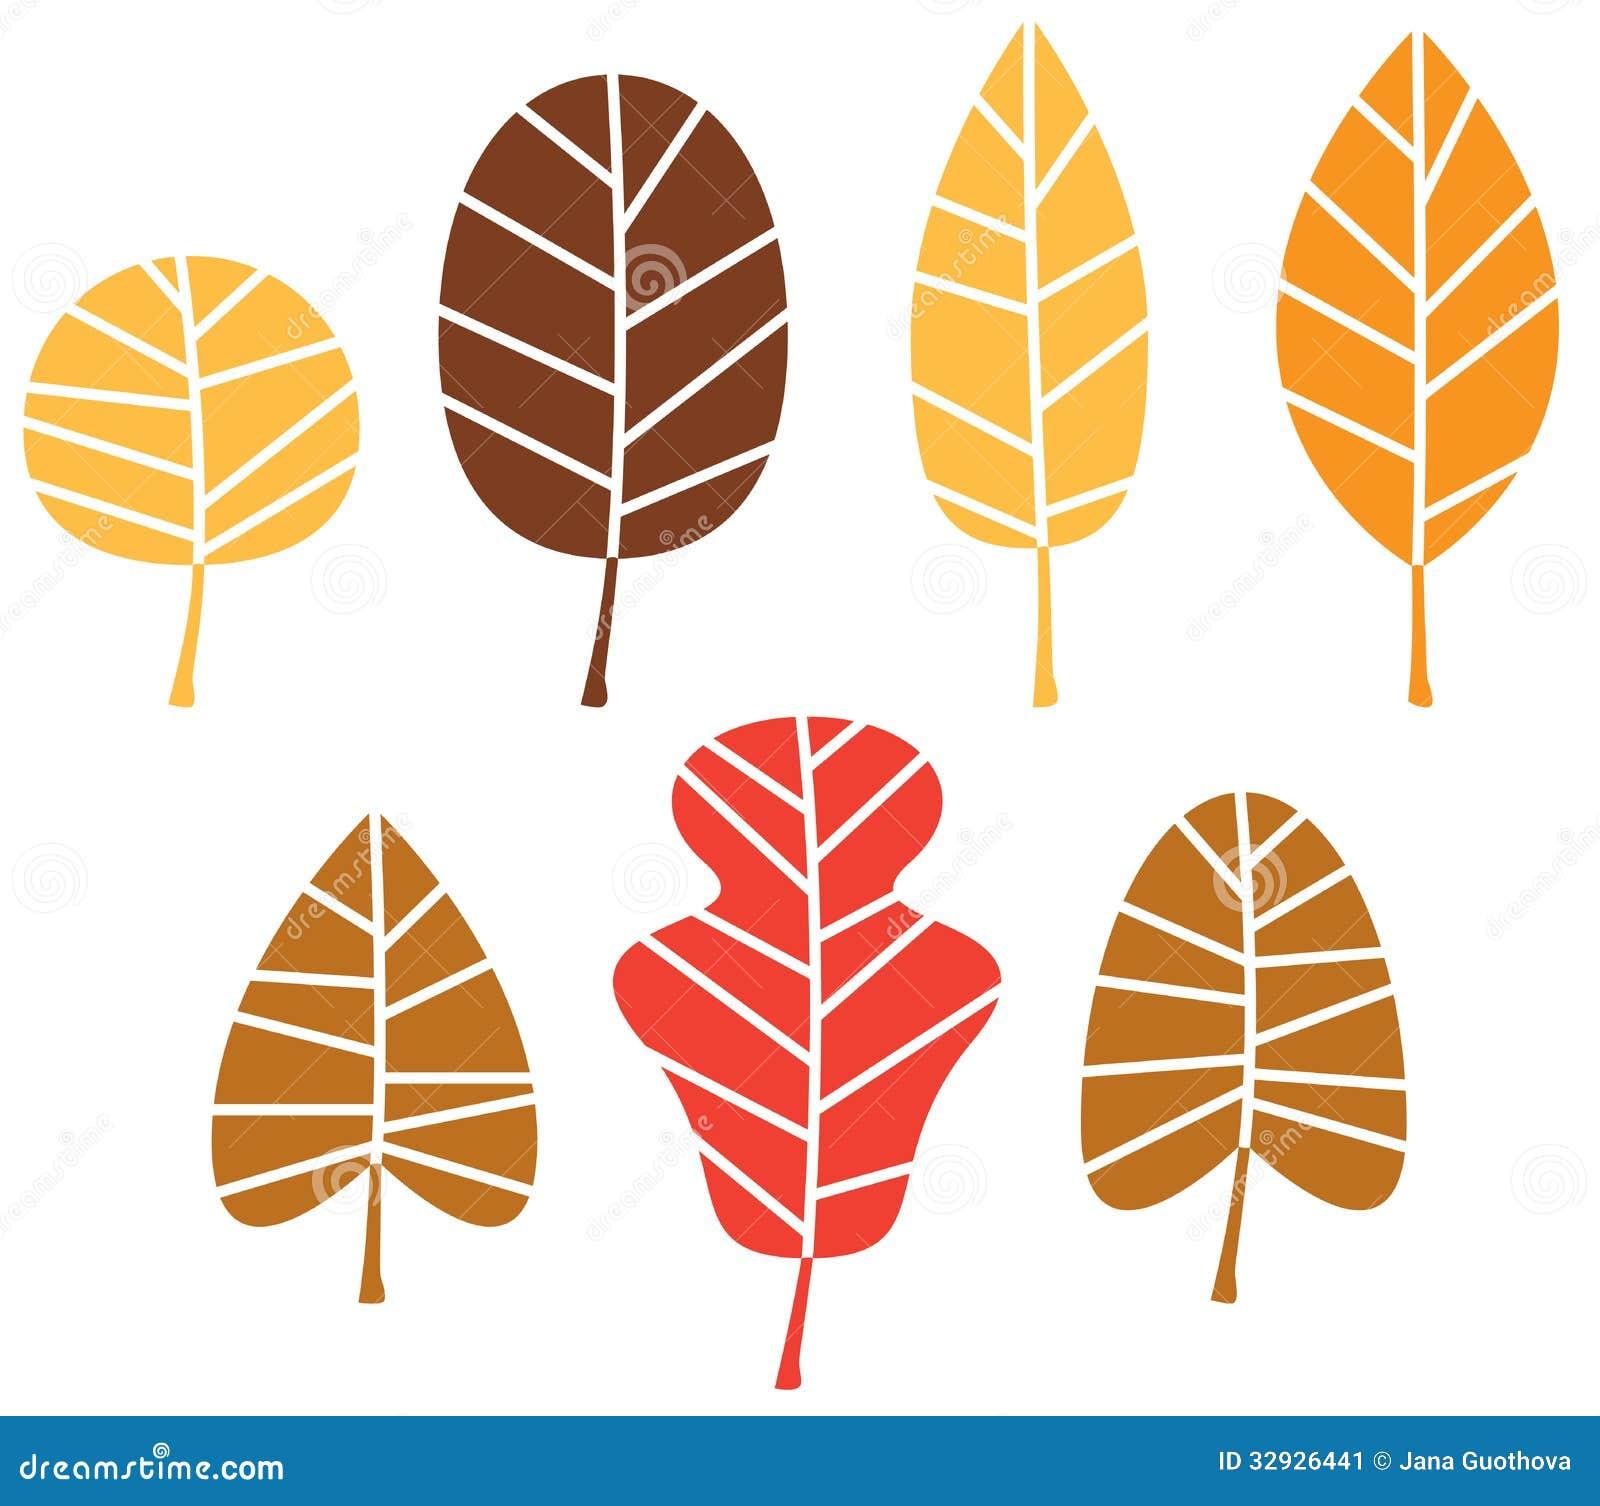 stylized autumn leaves mix vector illustration mr no pr no 3 3109 5